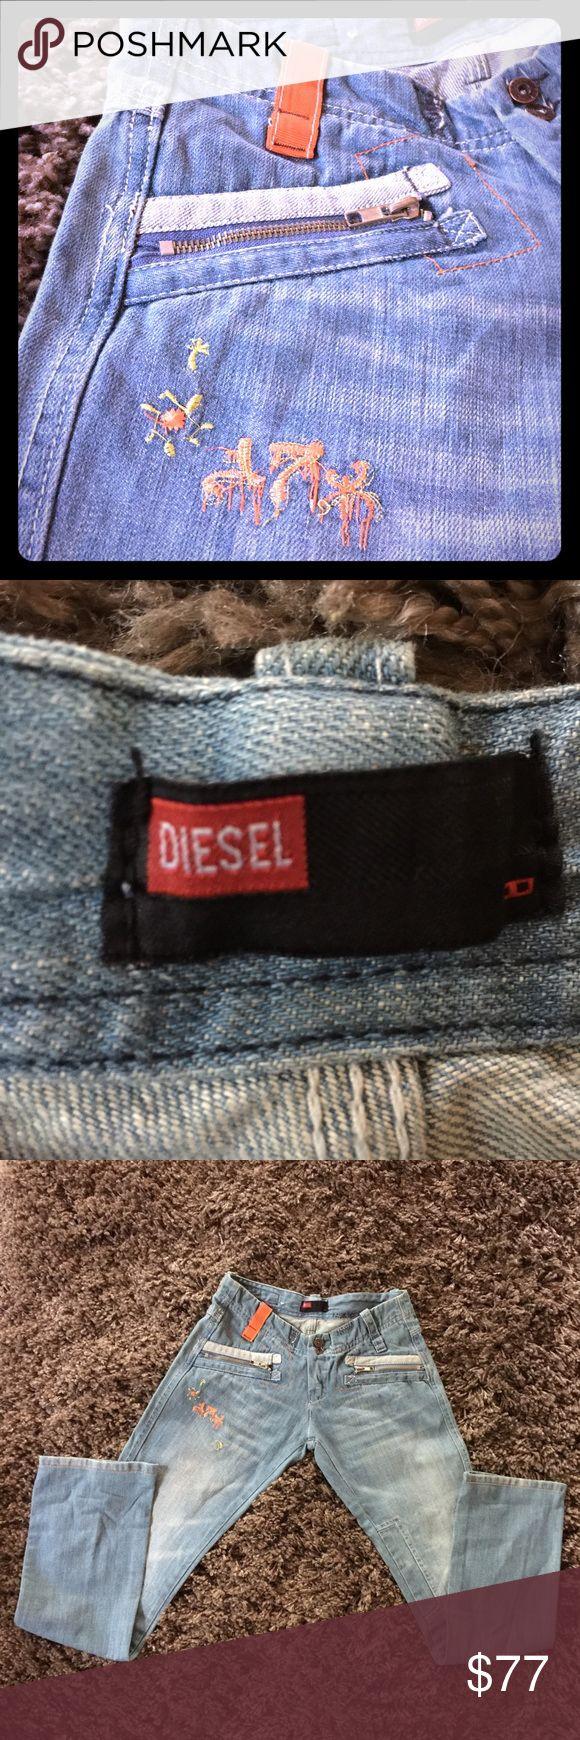 Unusual Deisel Jeans!!! Light blue wash. Embroidery. Color orange. Diesel jeans. Diesel Jeans Ankle & Cropped